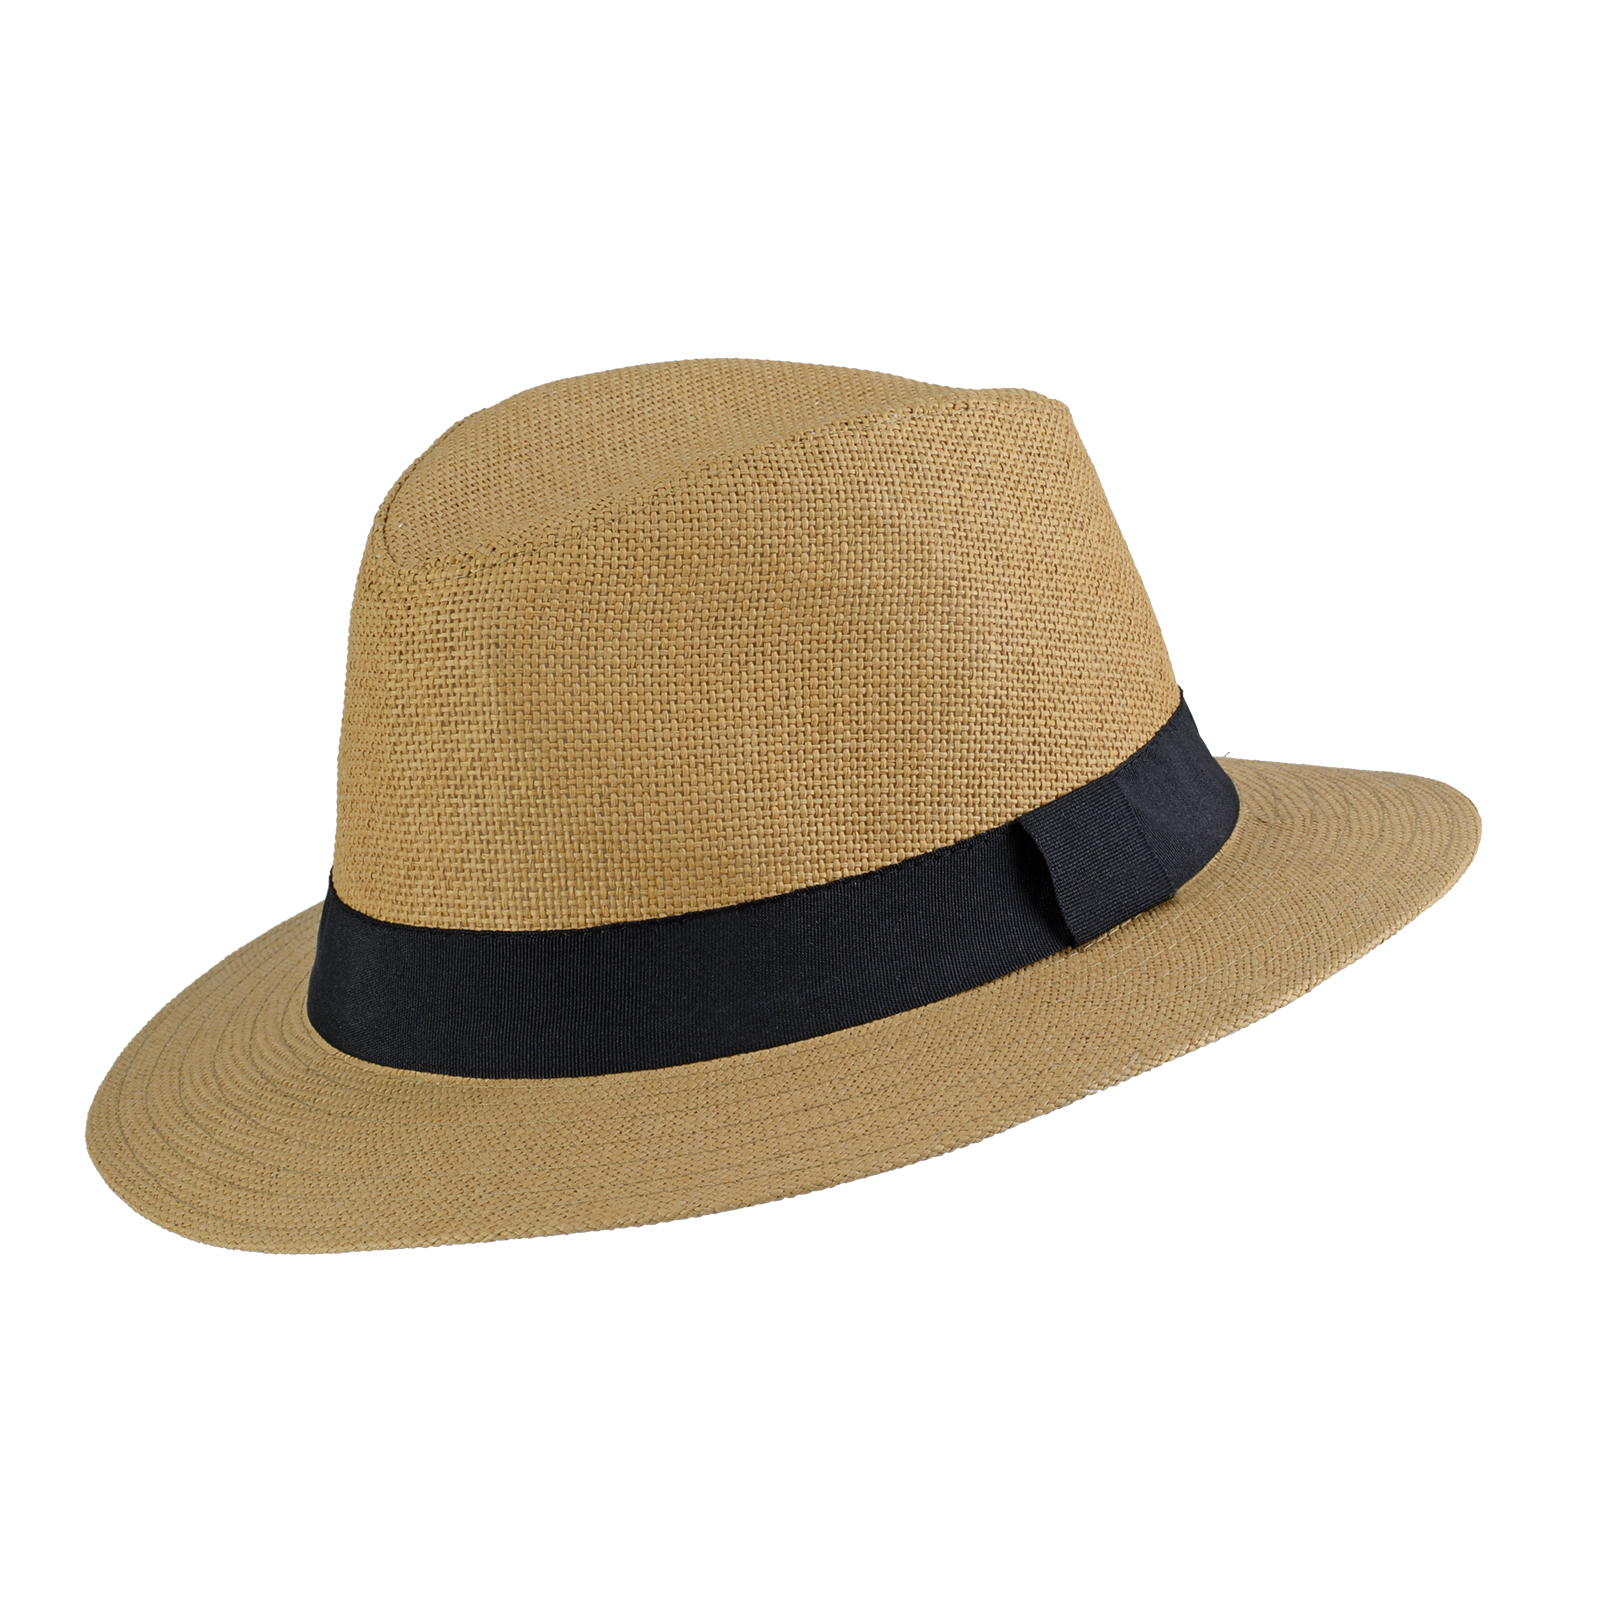 CP-00926-F16-chapeau-borsalino-paille-camel